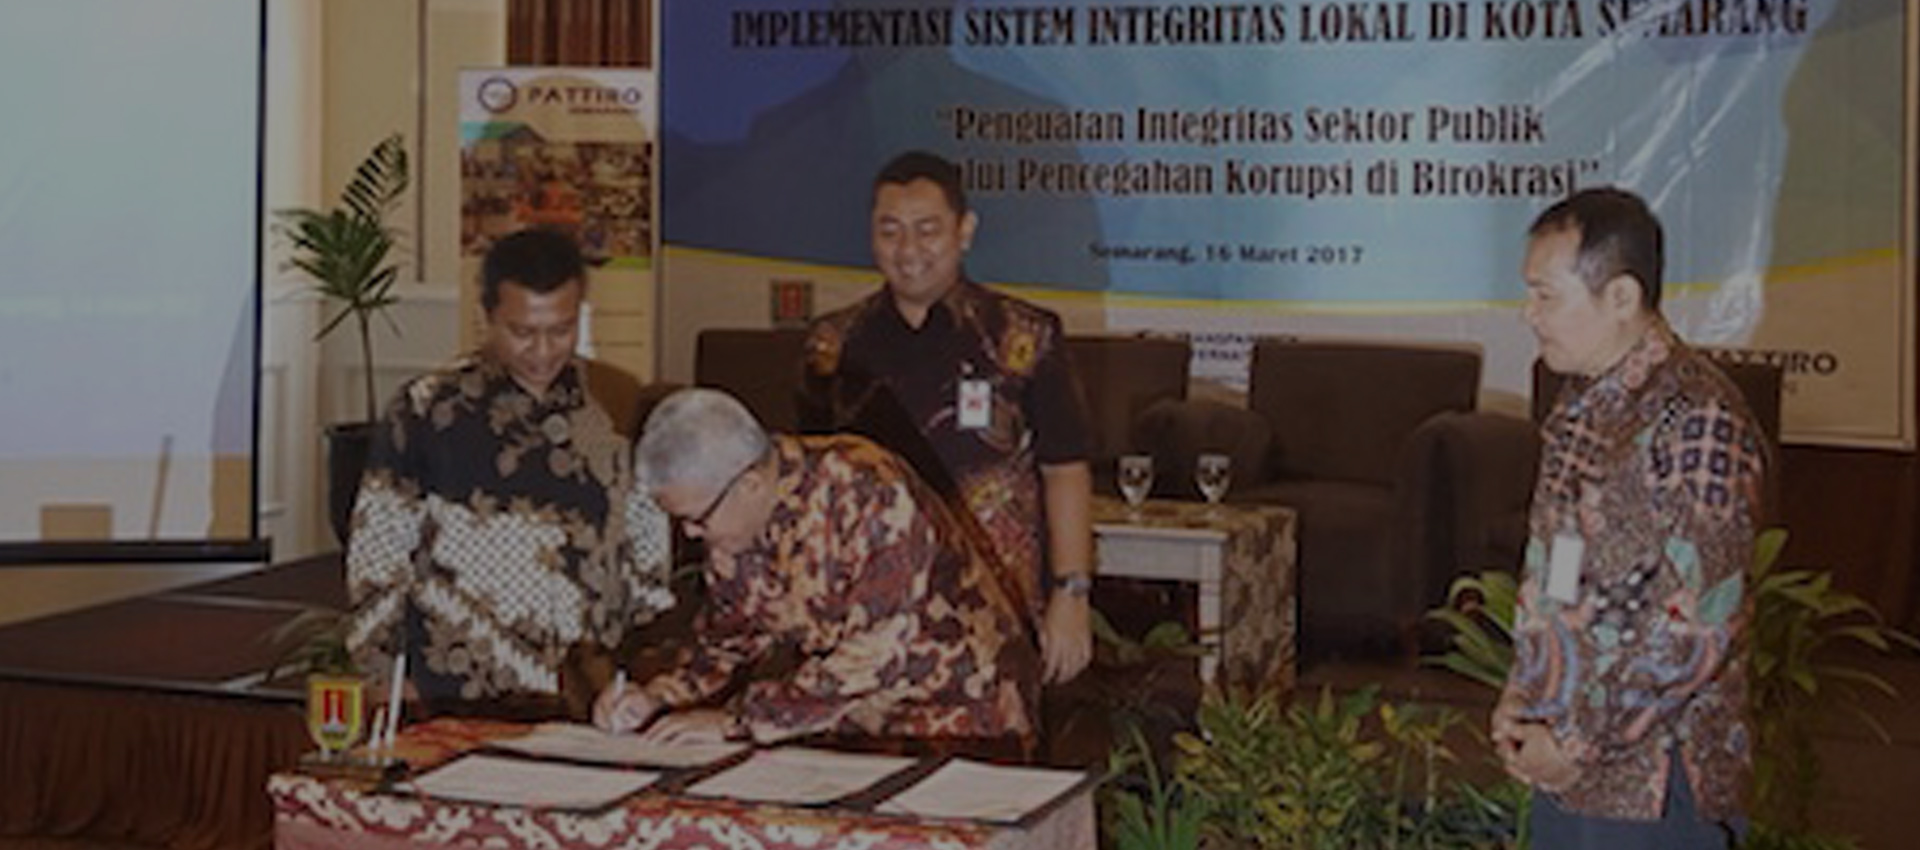 Cegah Korupsi, Pemkot Gandeng Pattiro dan TI Indonesia